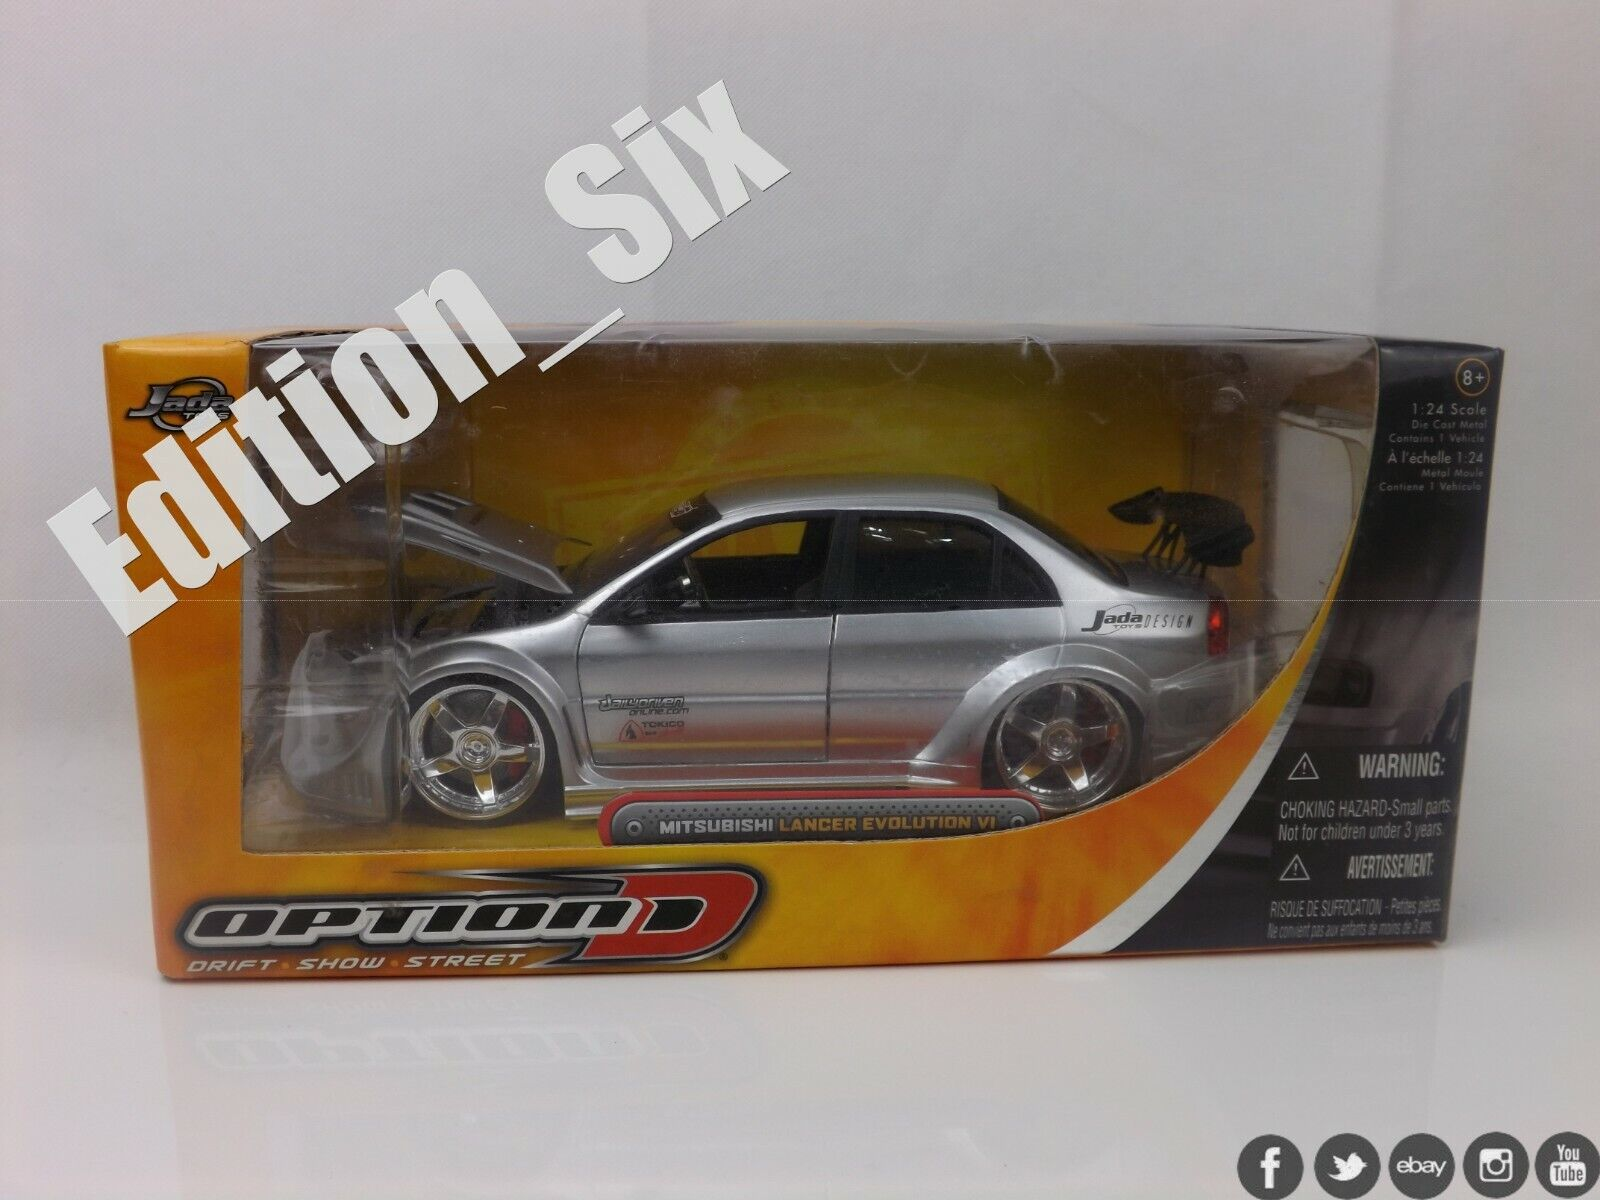 Jada Toys 1 24 Mitsubishi Lancer Evolution Evo VI 6 Caja de coche deportivo modificado JDM